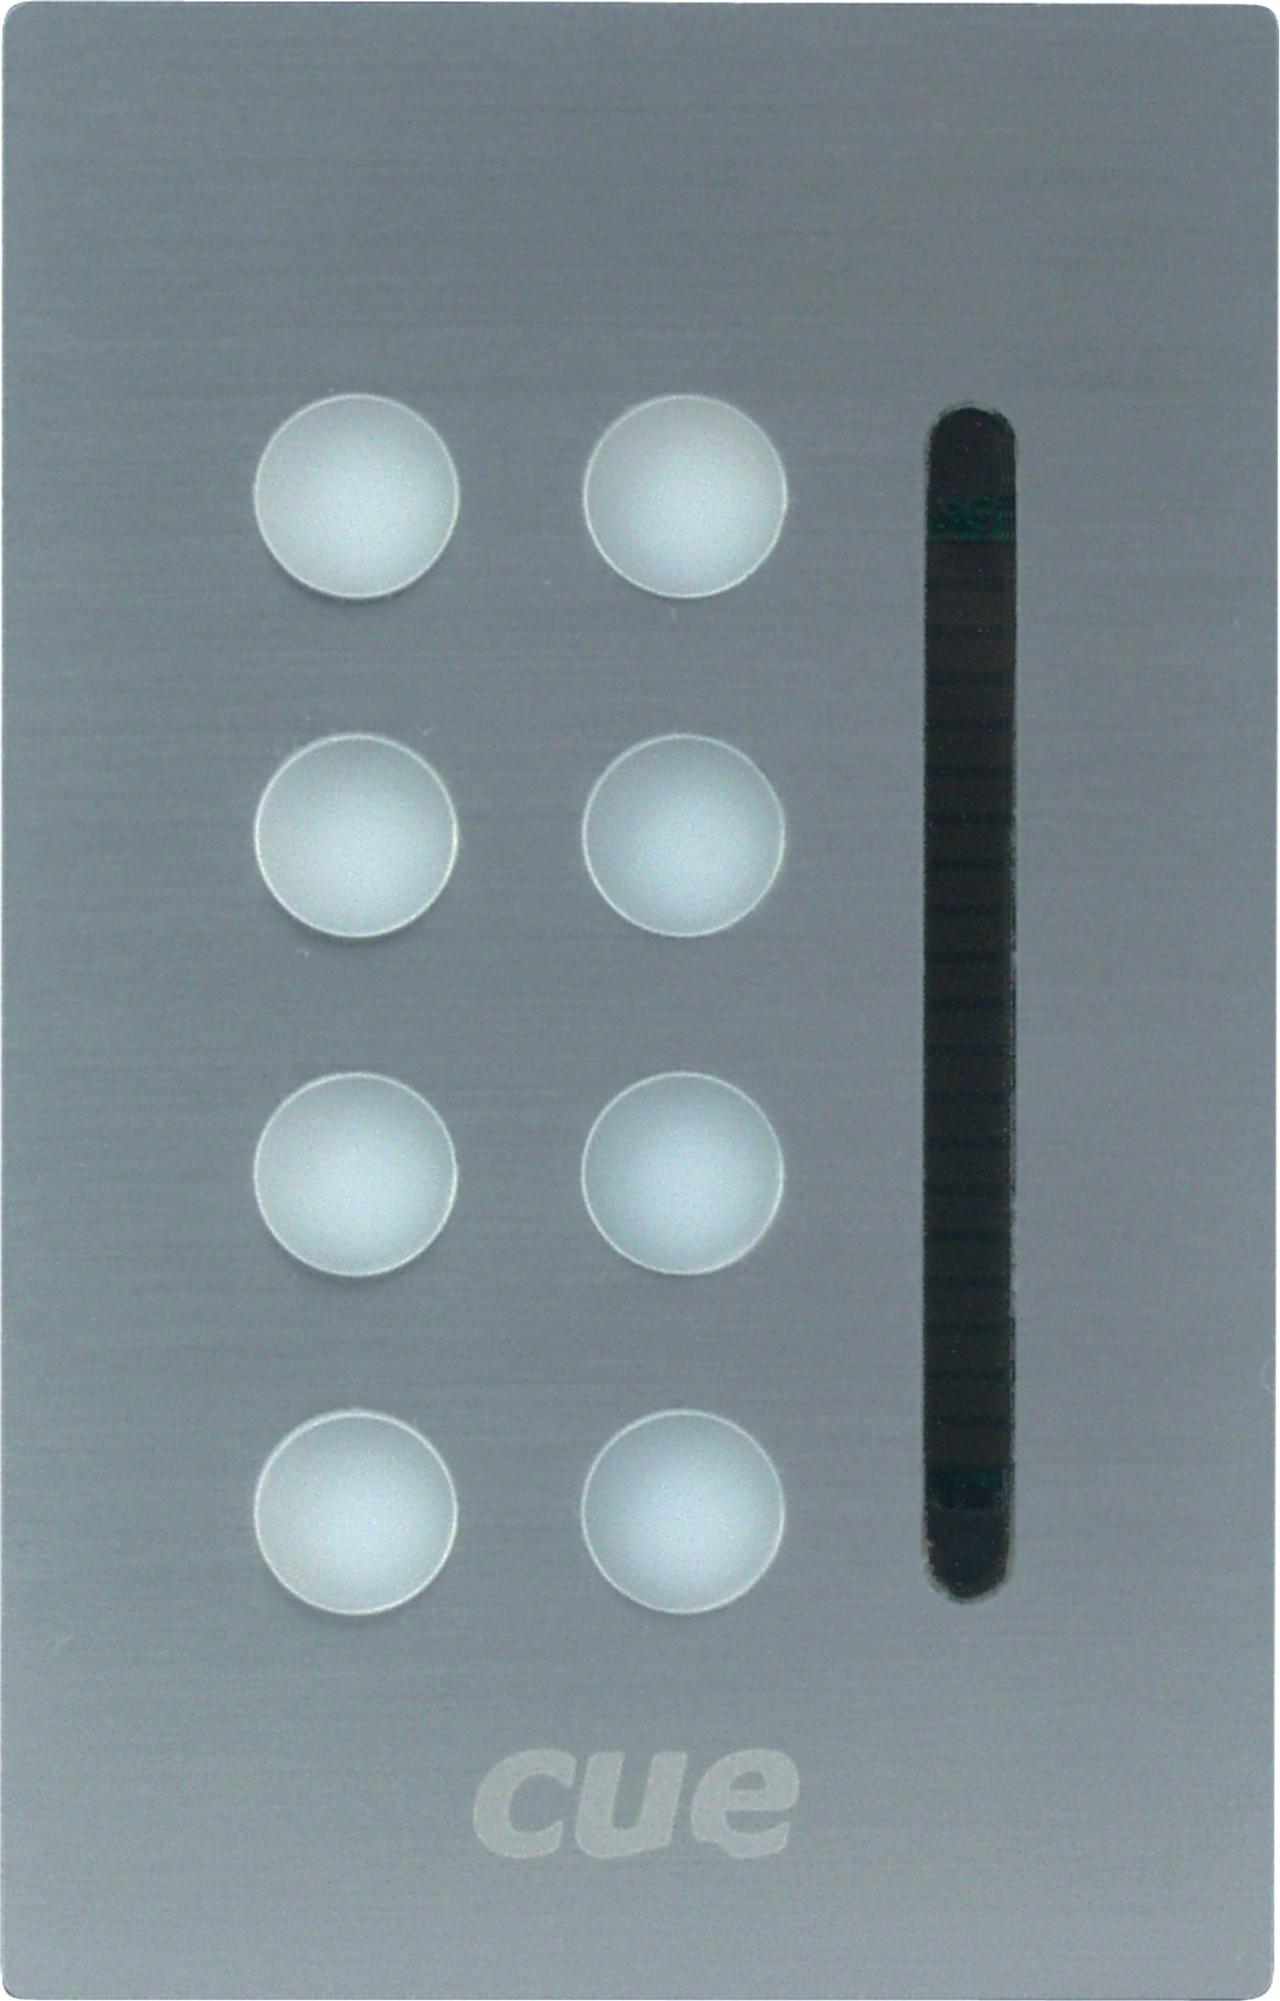 KeypadCUE-1G